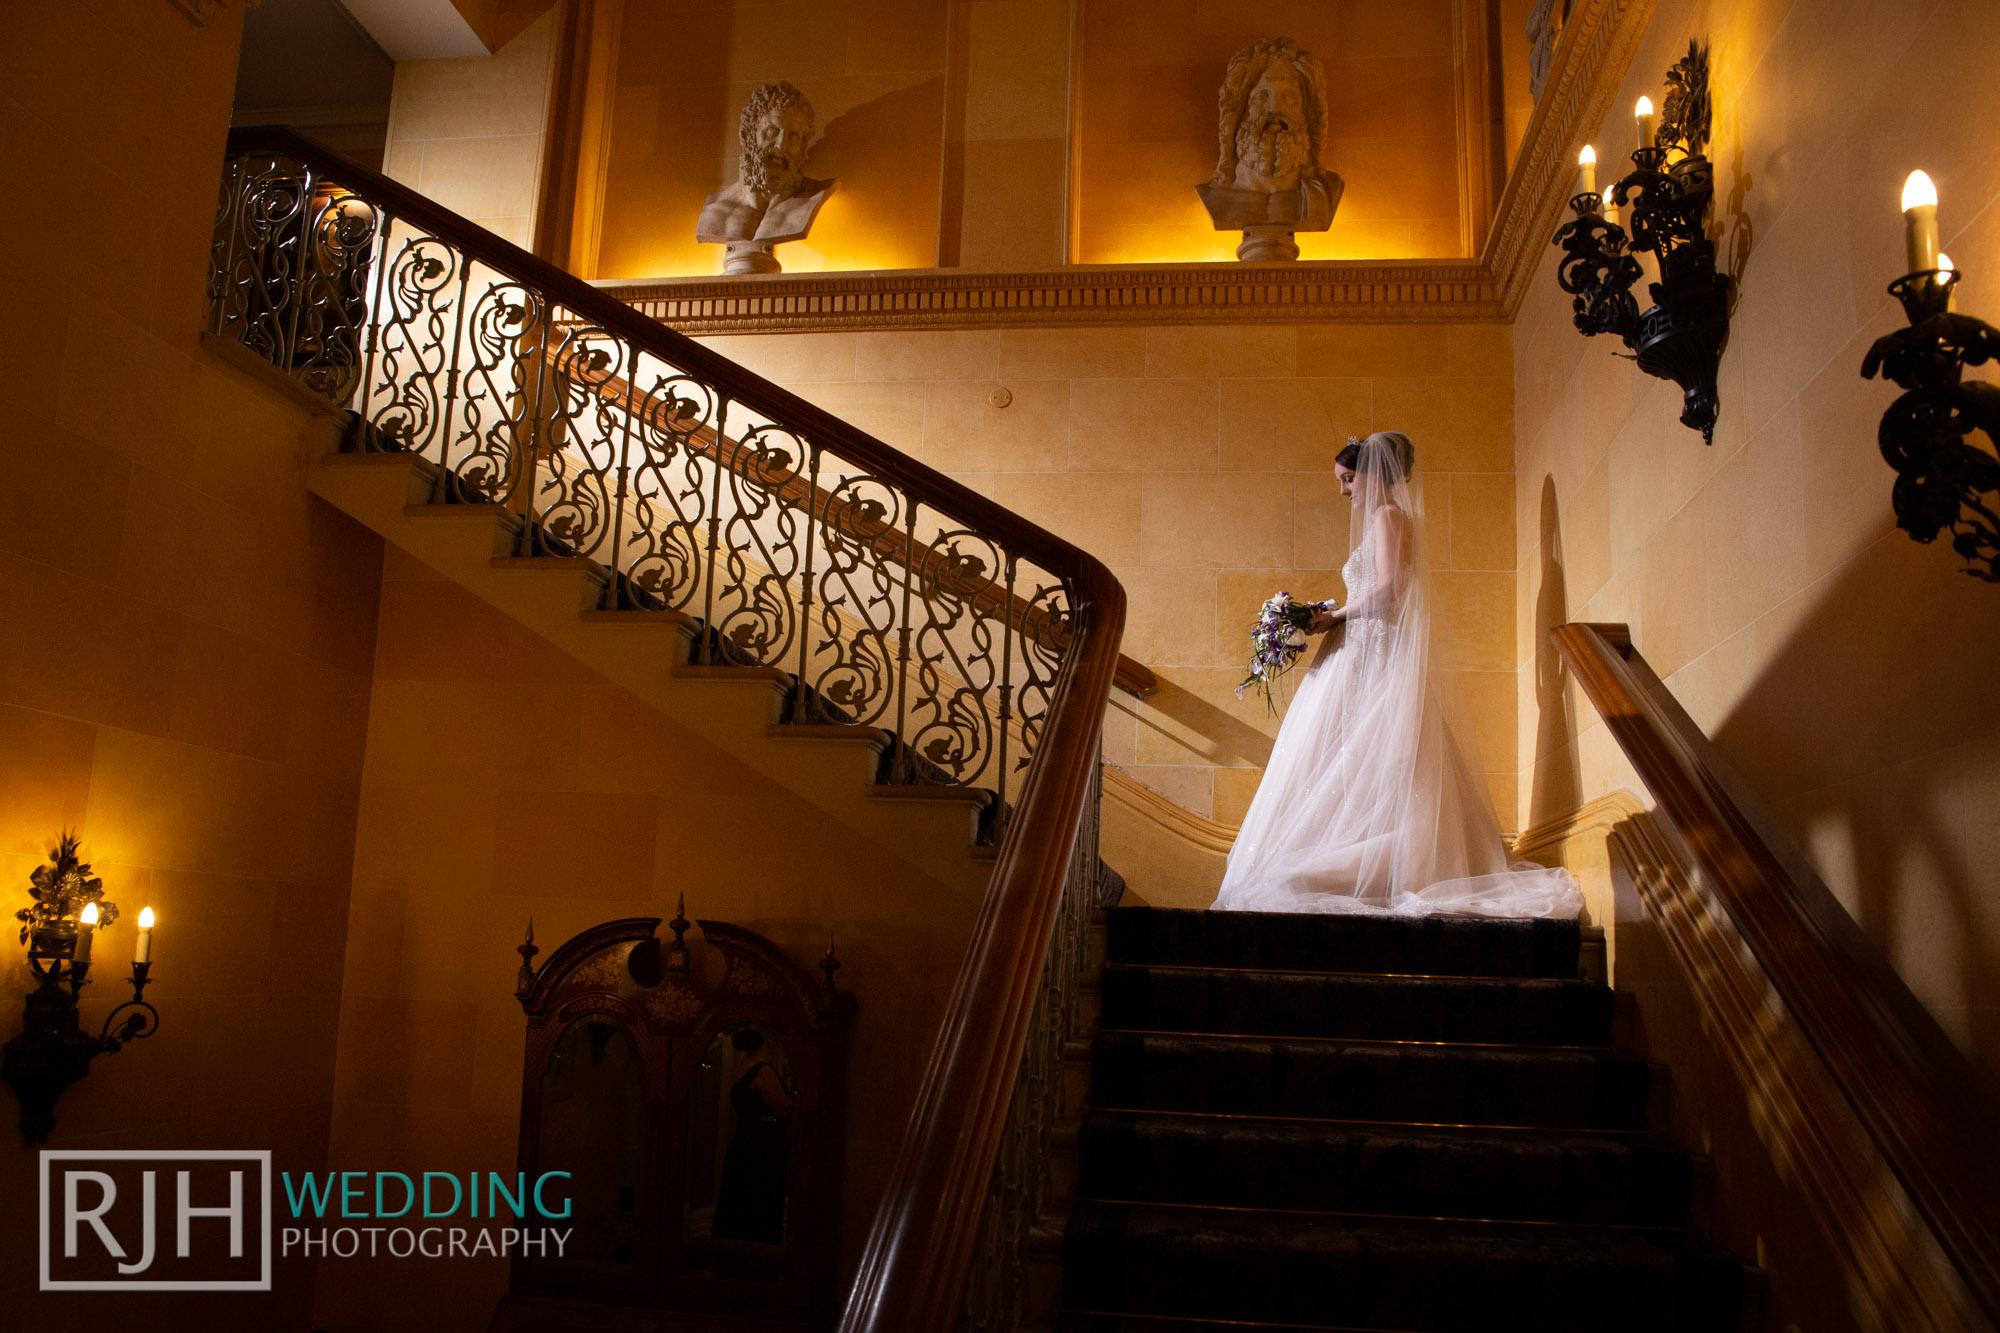 Oulton Hall Wedding Photography_Goodwill-Hall_050_IMG_6887.jpg